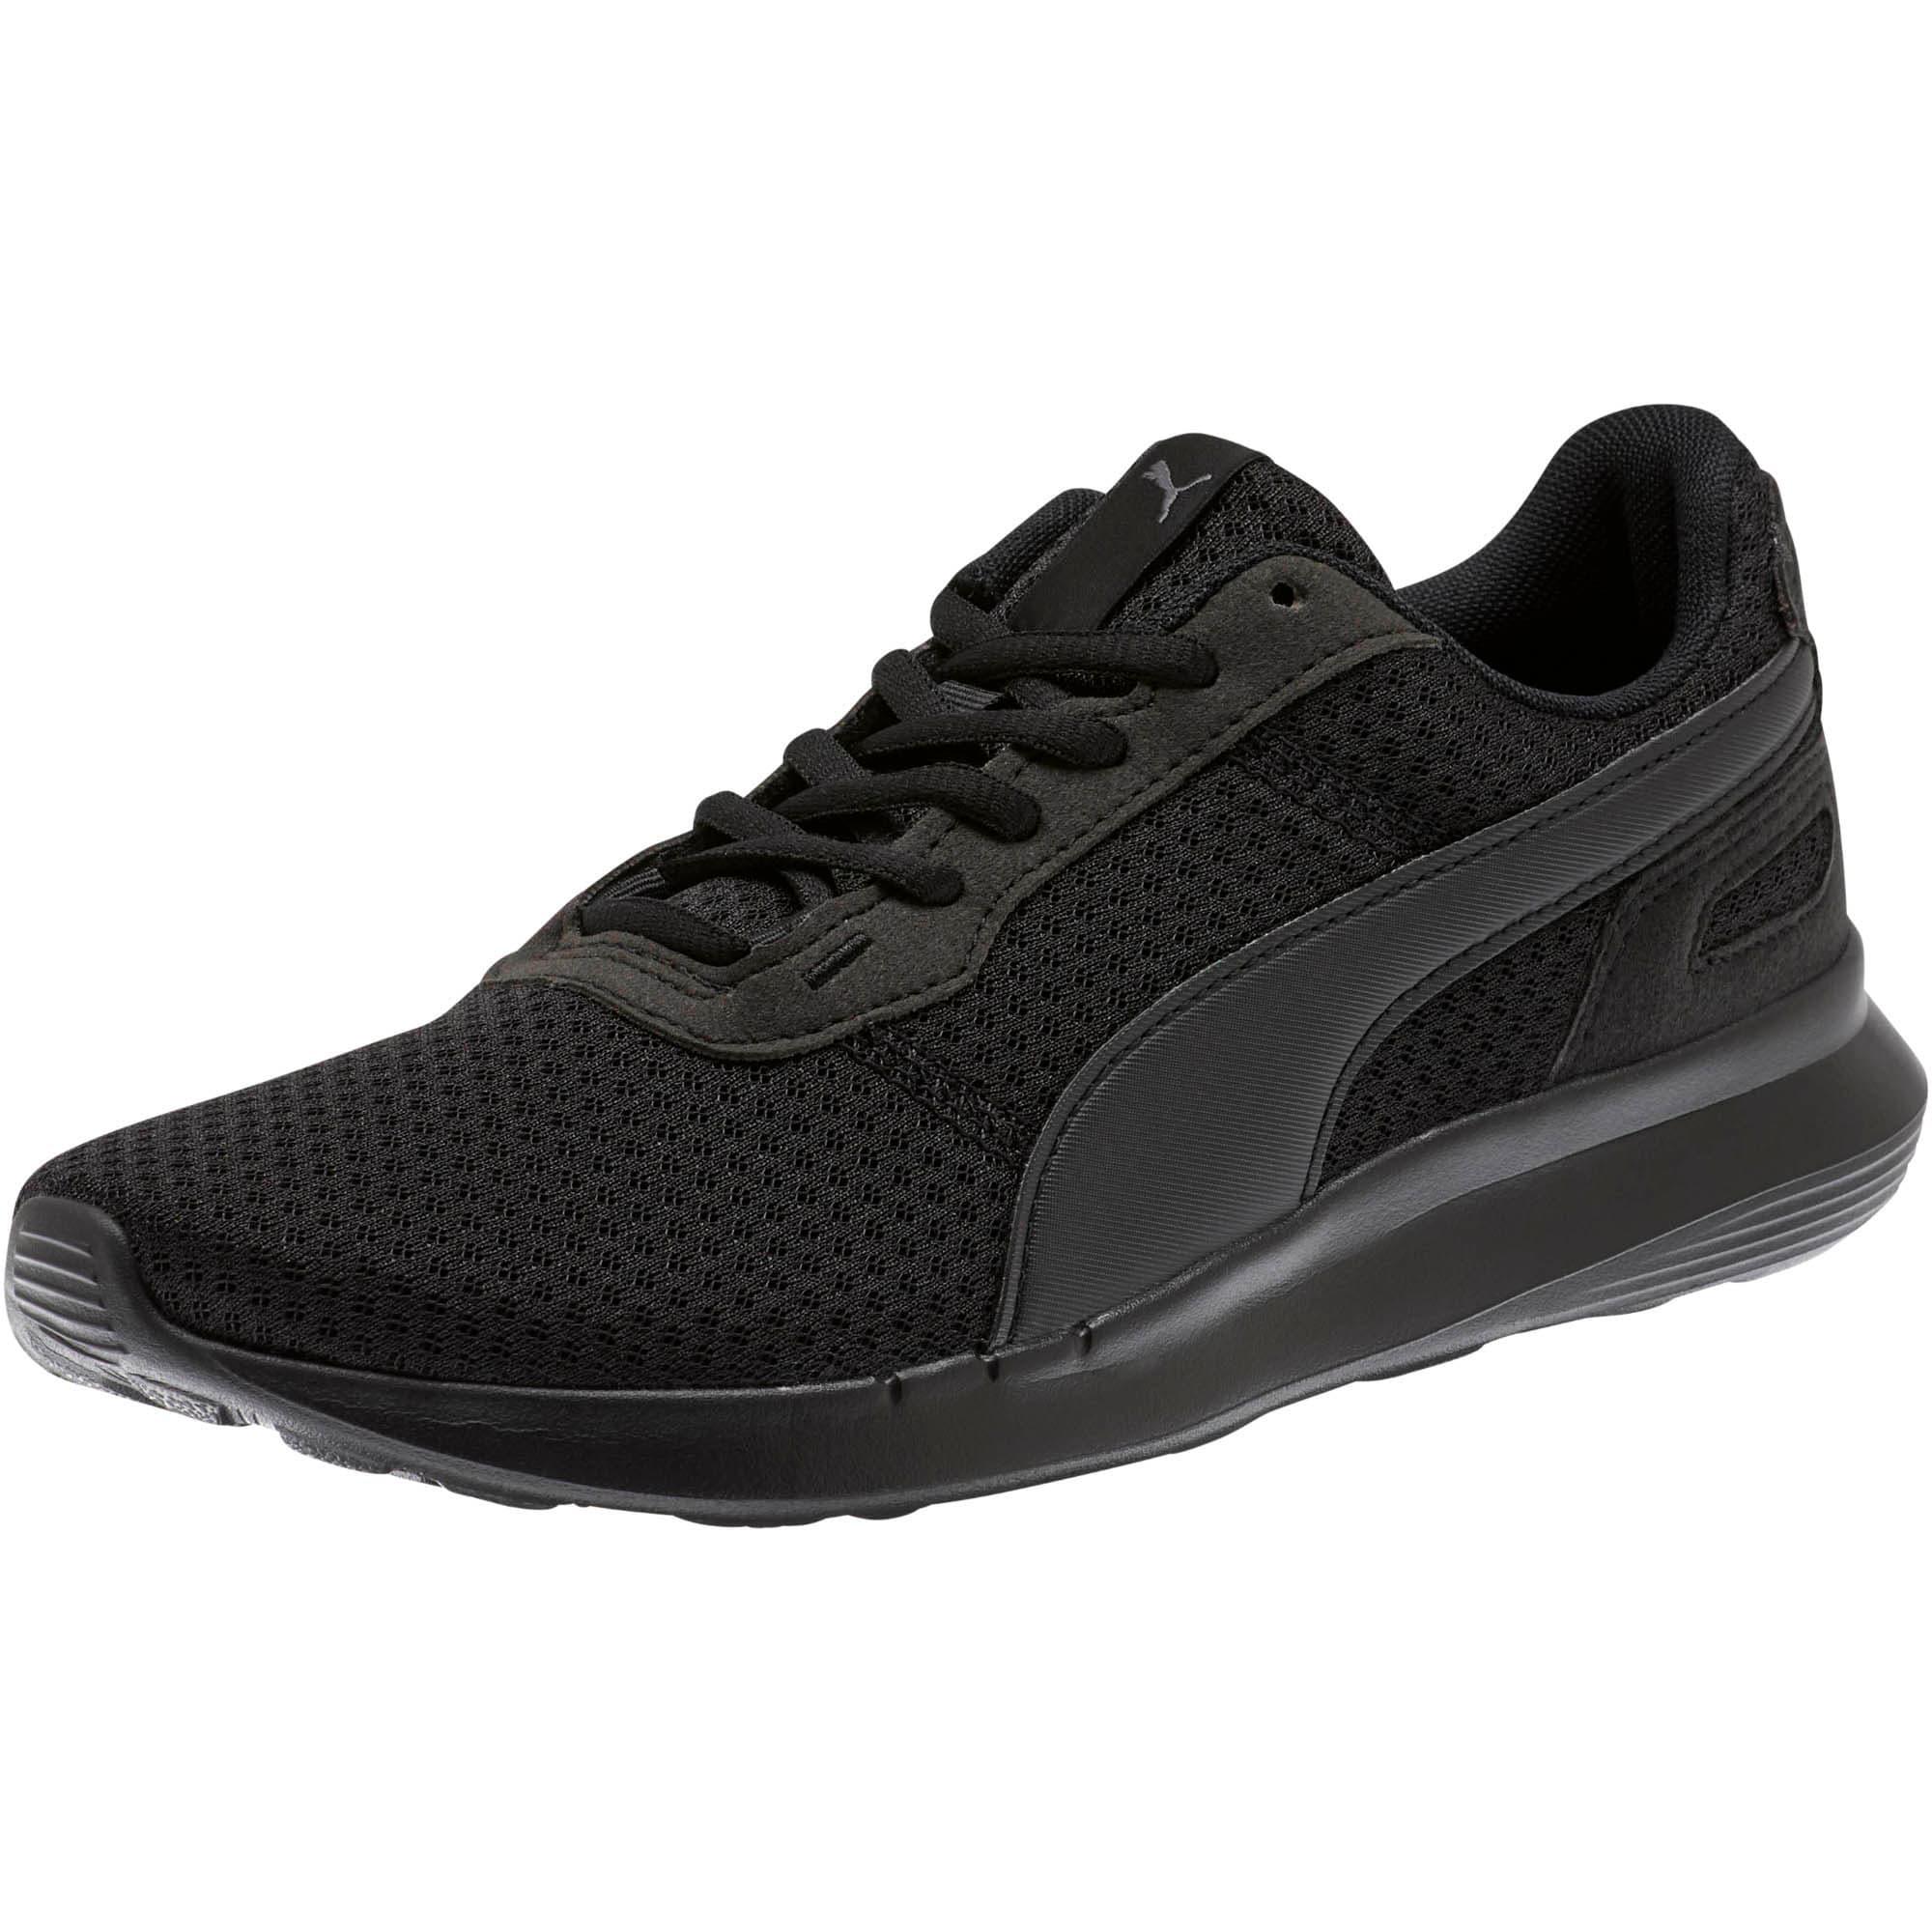 Thumbnail 1 of ST Activate Women's Sneakers, Puma Black-Puma Black, medium